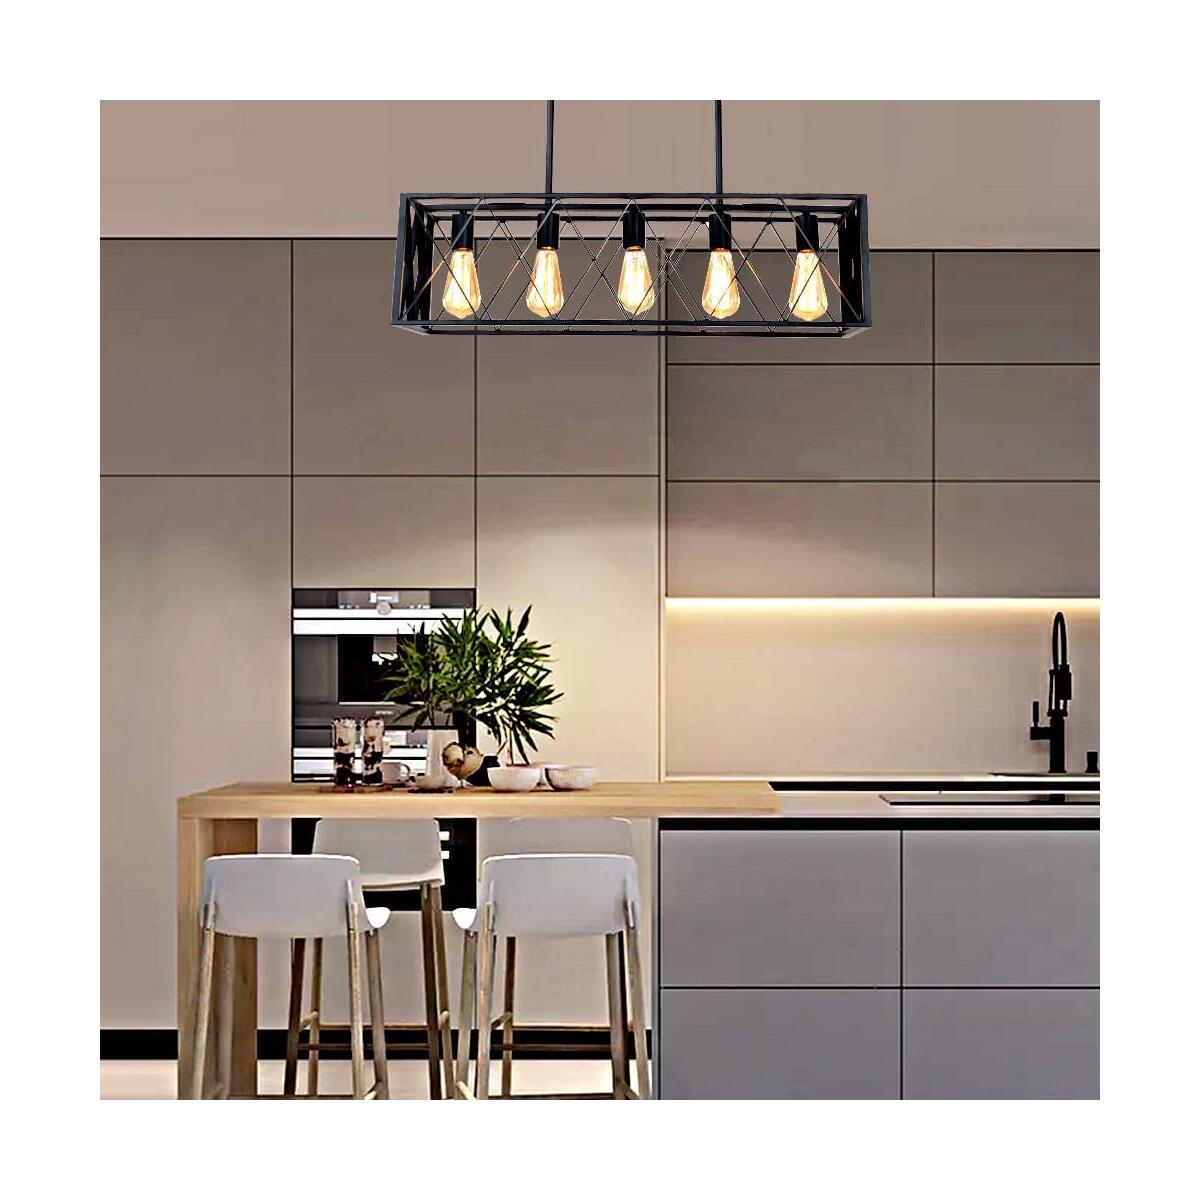 Modern 5-Light Industrial Kitchen Island Lighting, 30.3